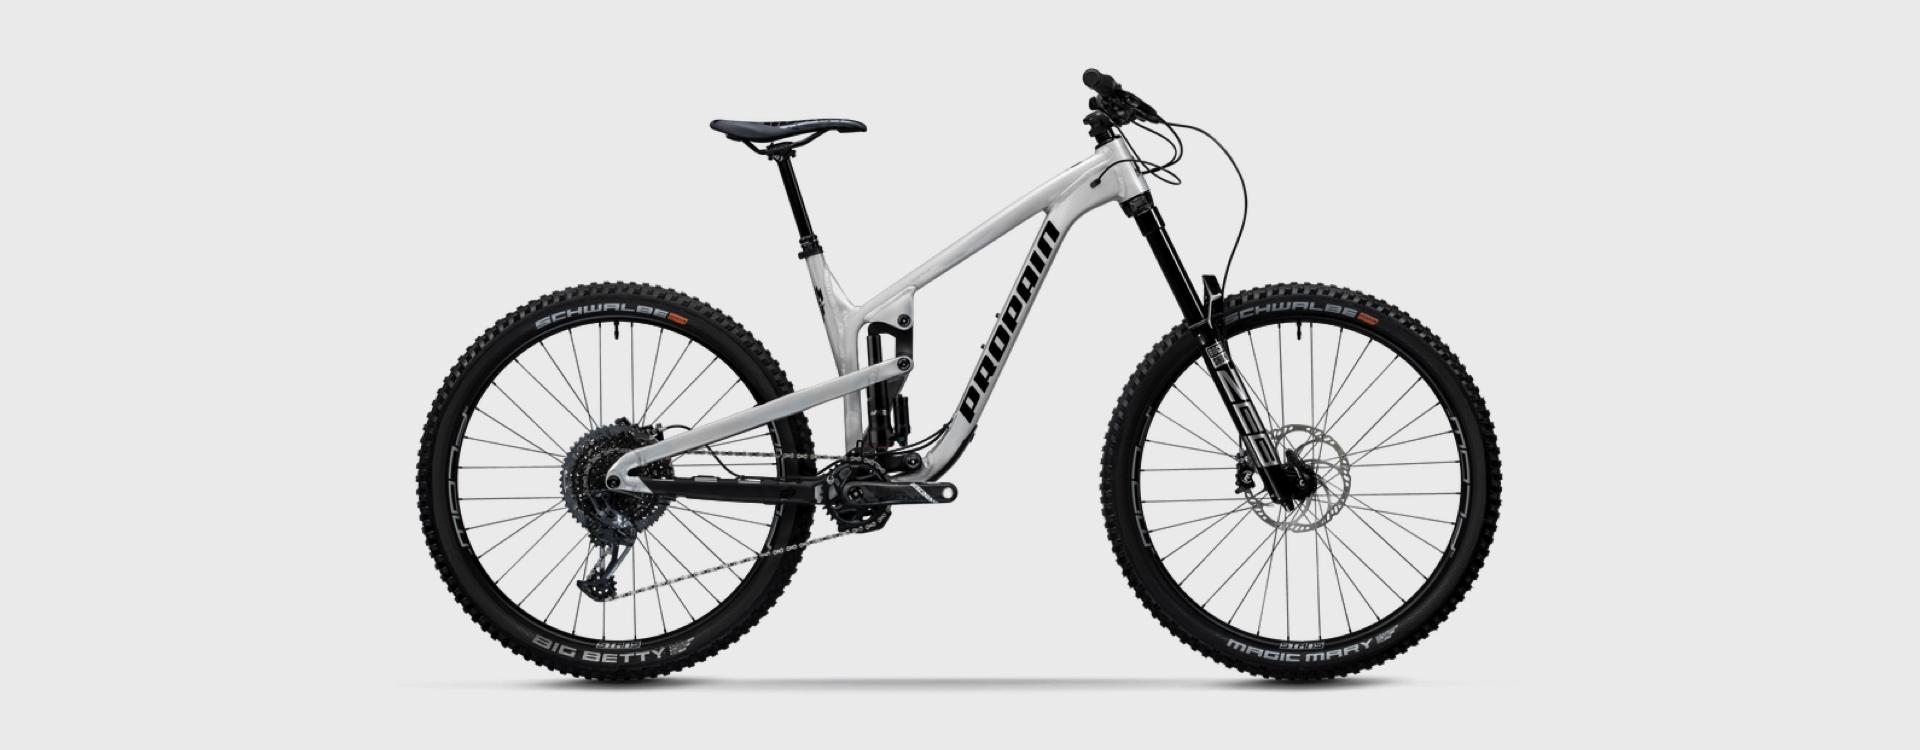 Bike Verleih Gummersbach Propain Bikes Testcenter NRW Spindrift 5 - AL - L - Mix - Raw - 1920x750